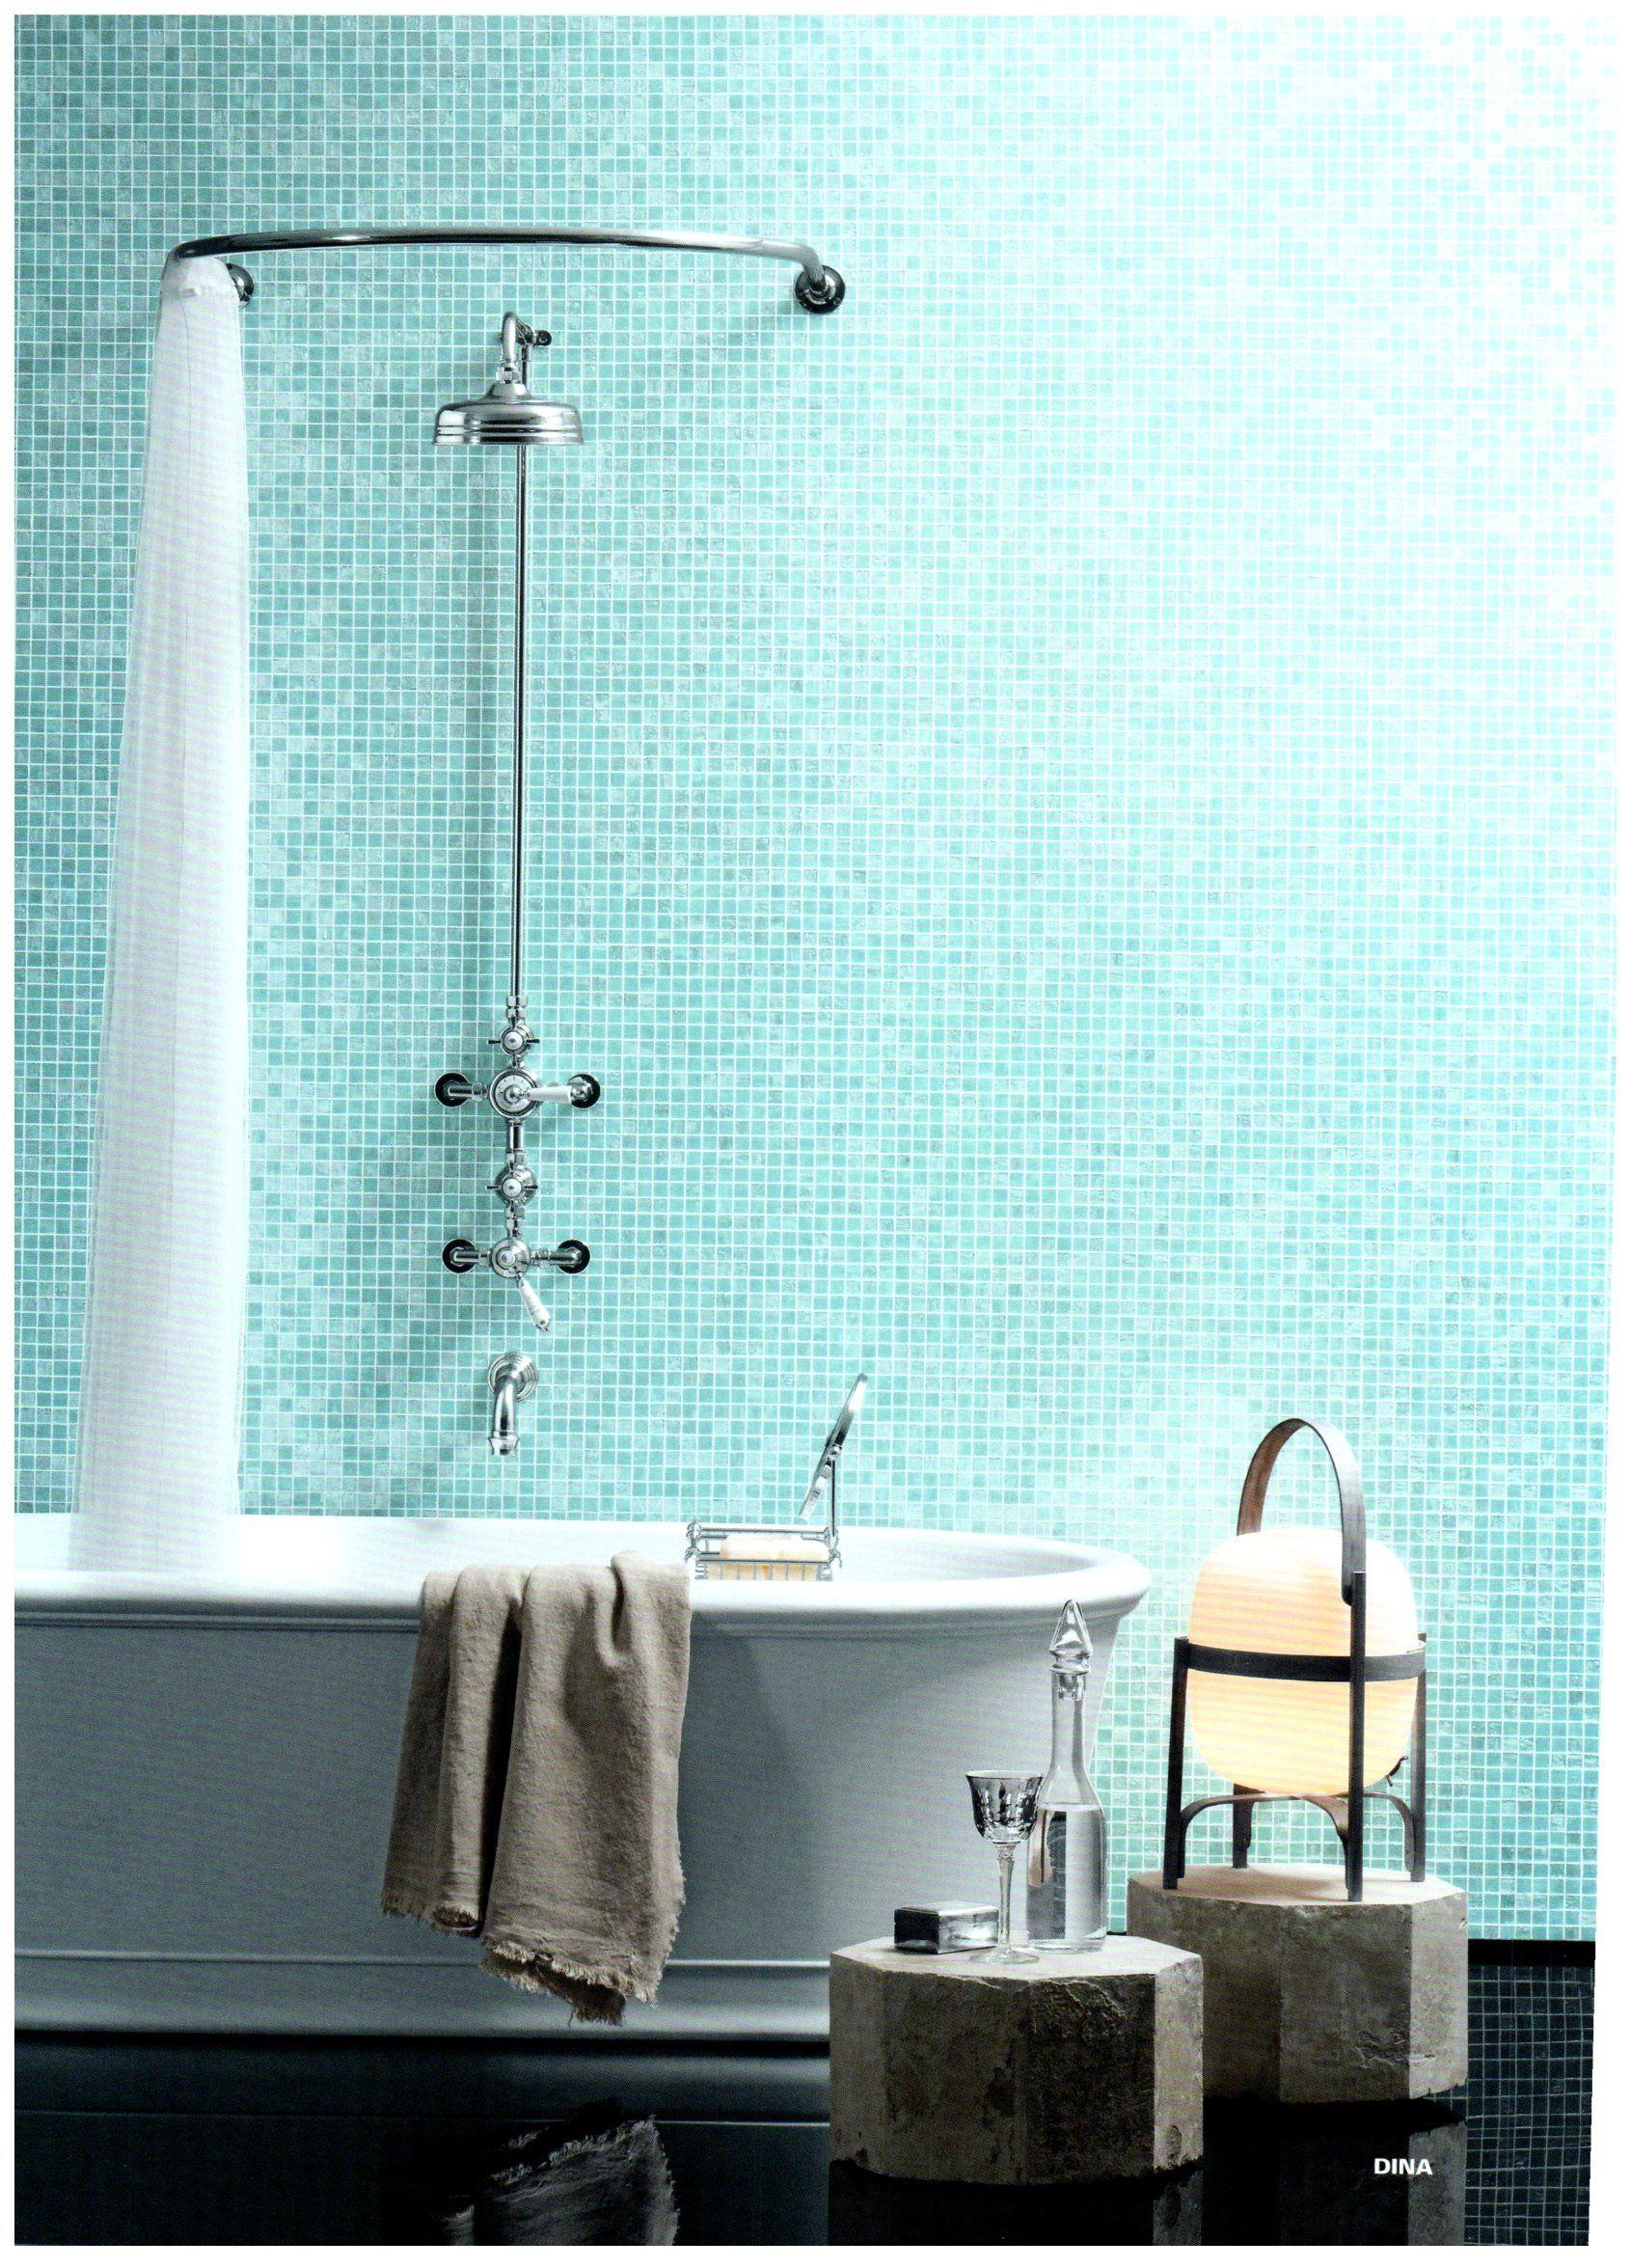 bisazza dina | Mosaic Tile | Pinterest | Bathroom tiling and Mosaics